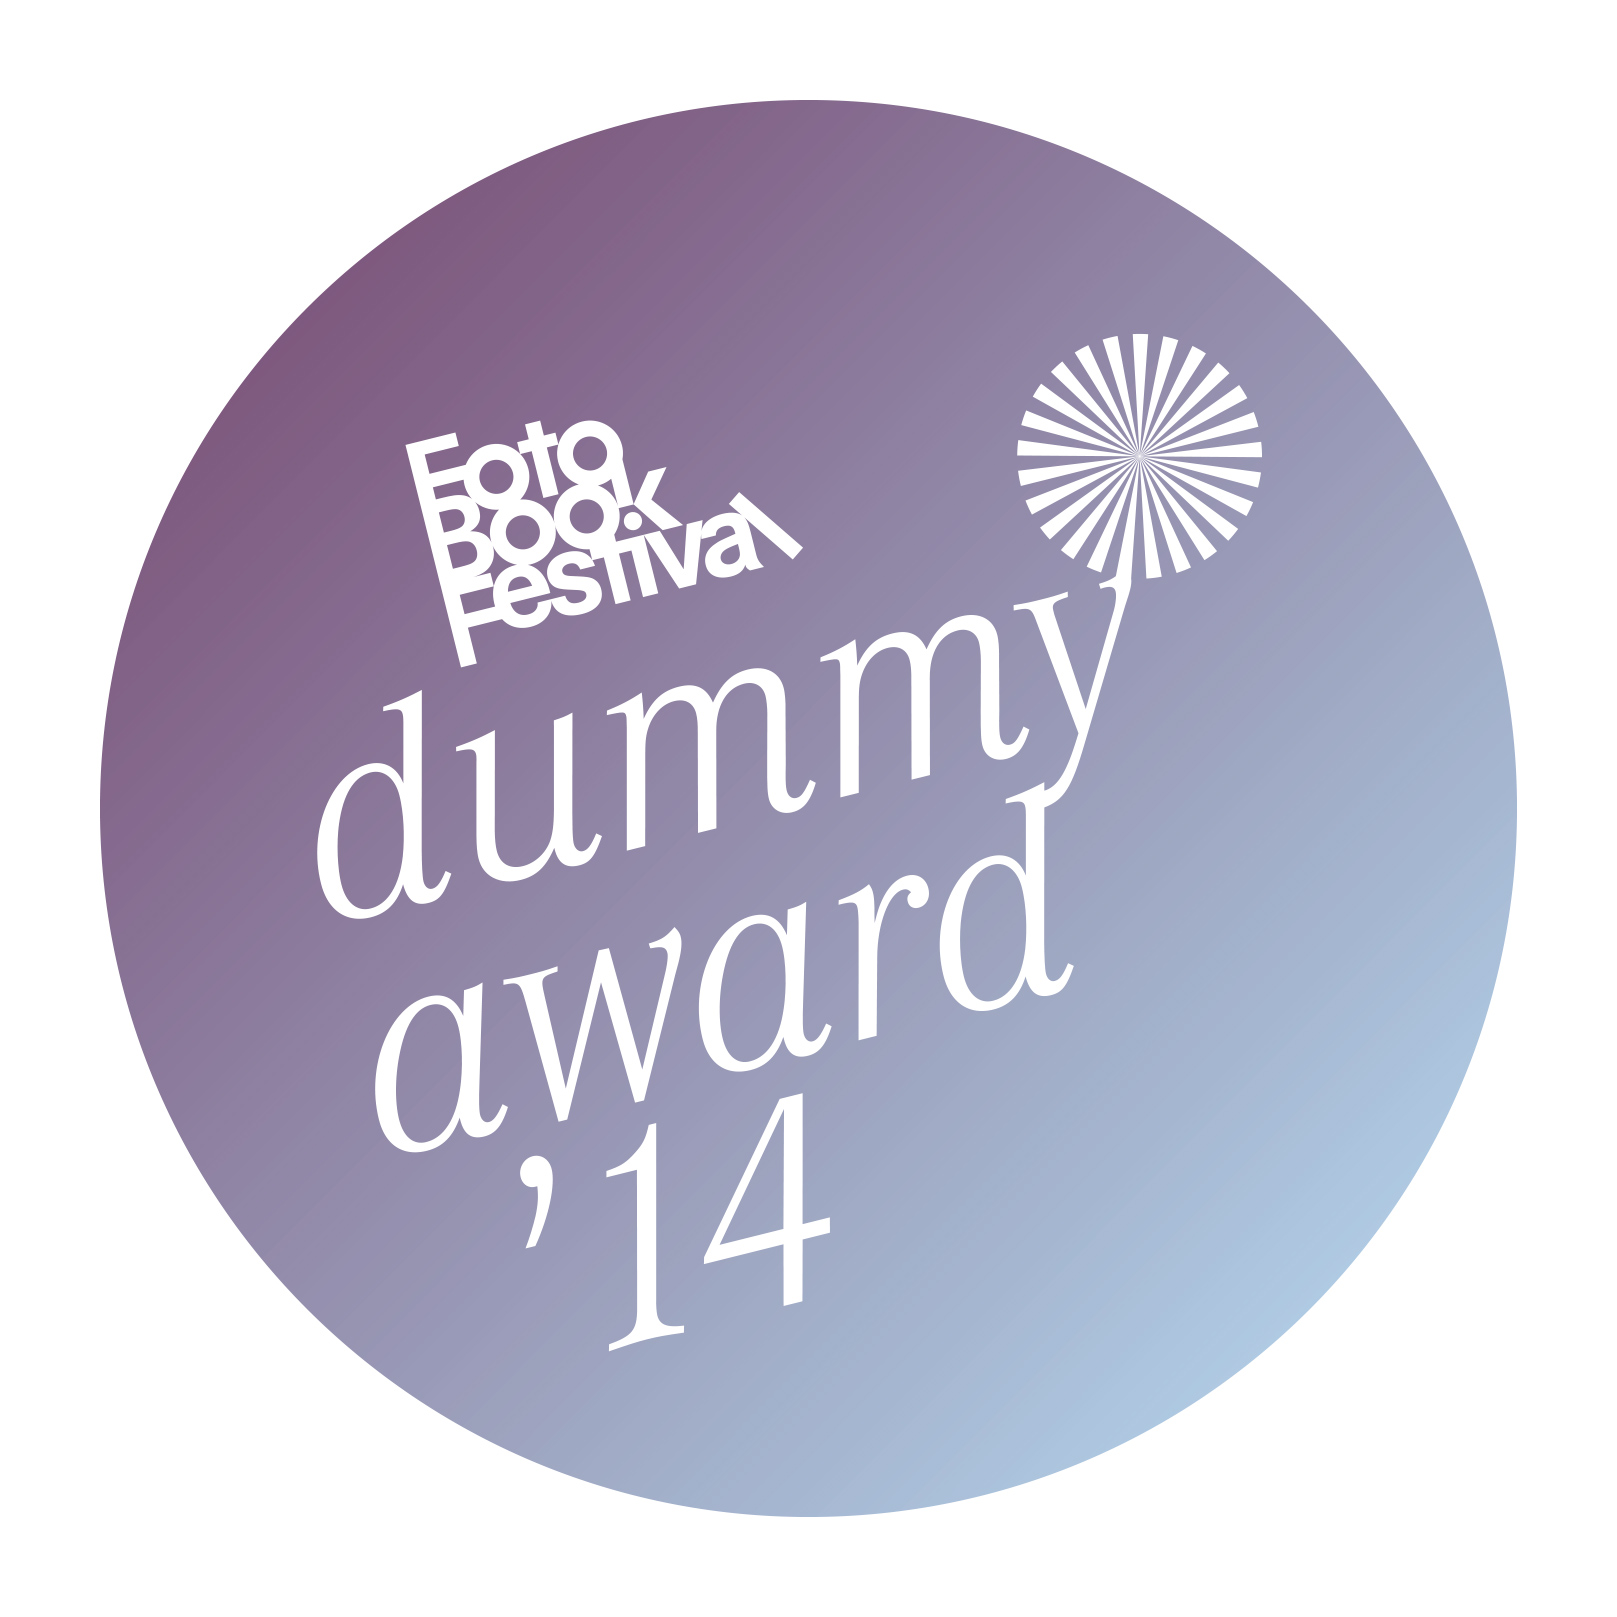 Winners Announced: The Fotobookfestival Kassel Dummy Awards 2014